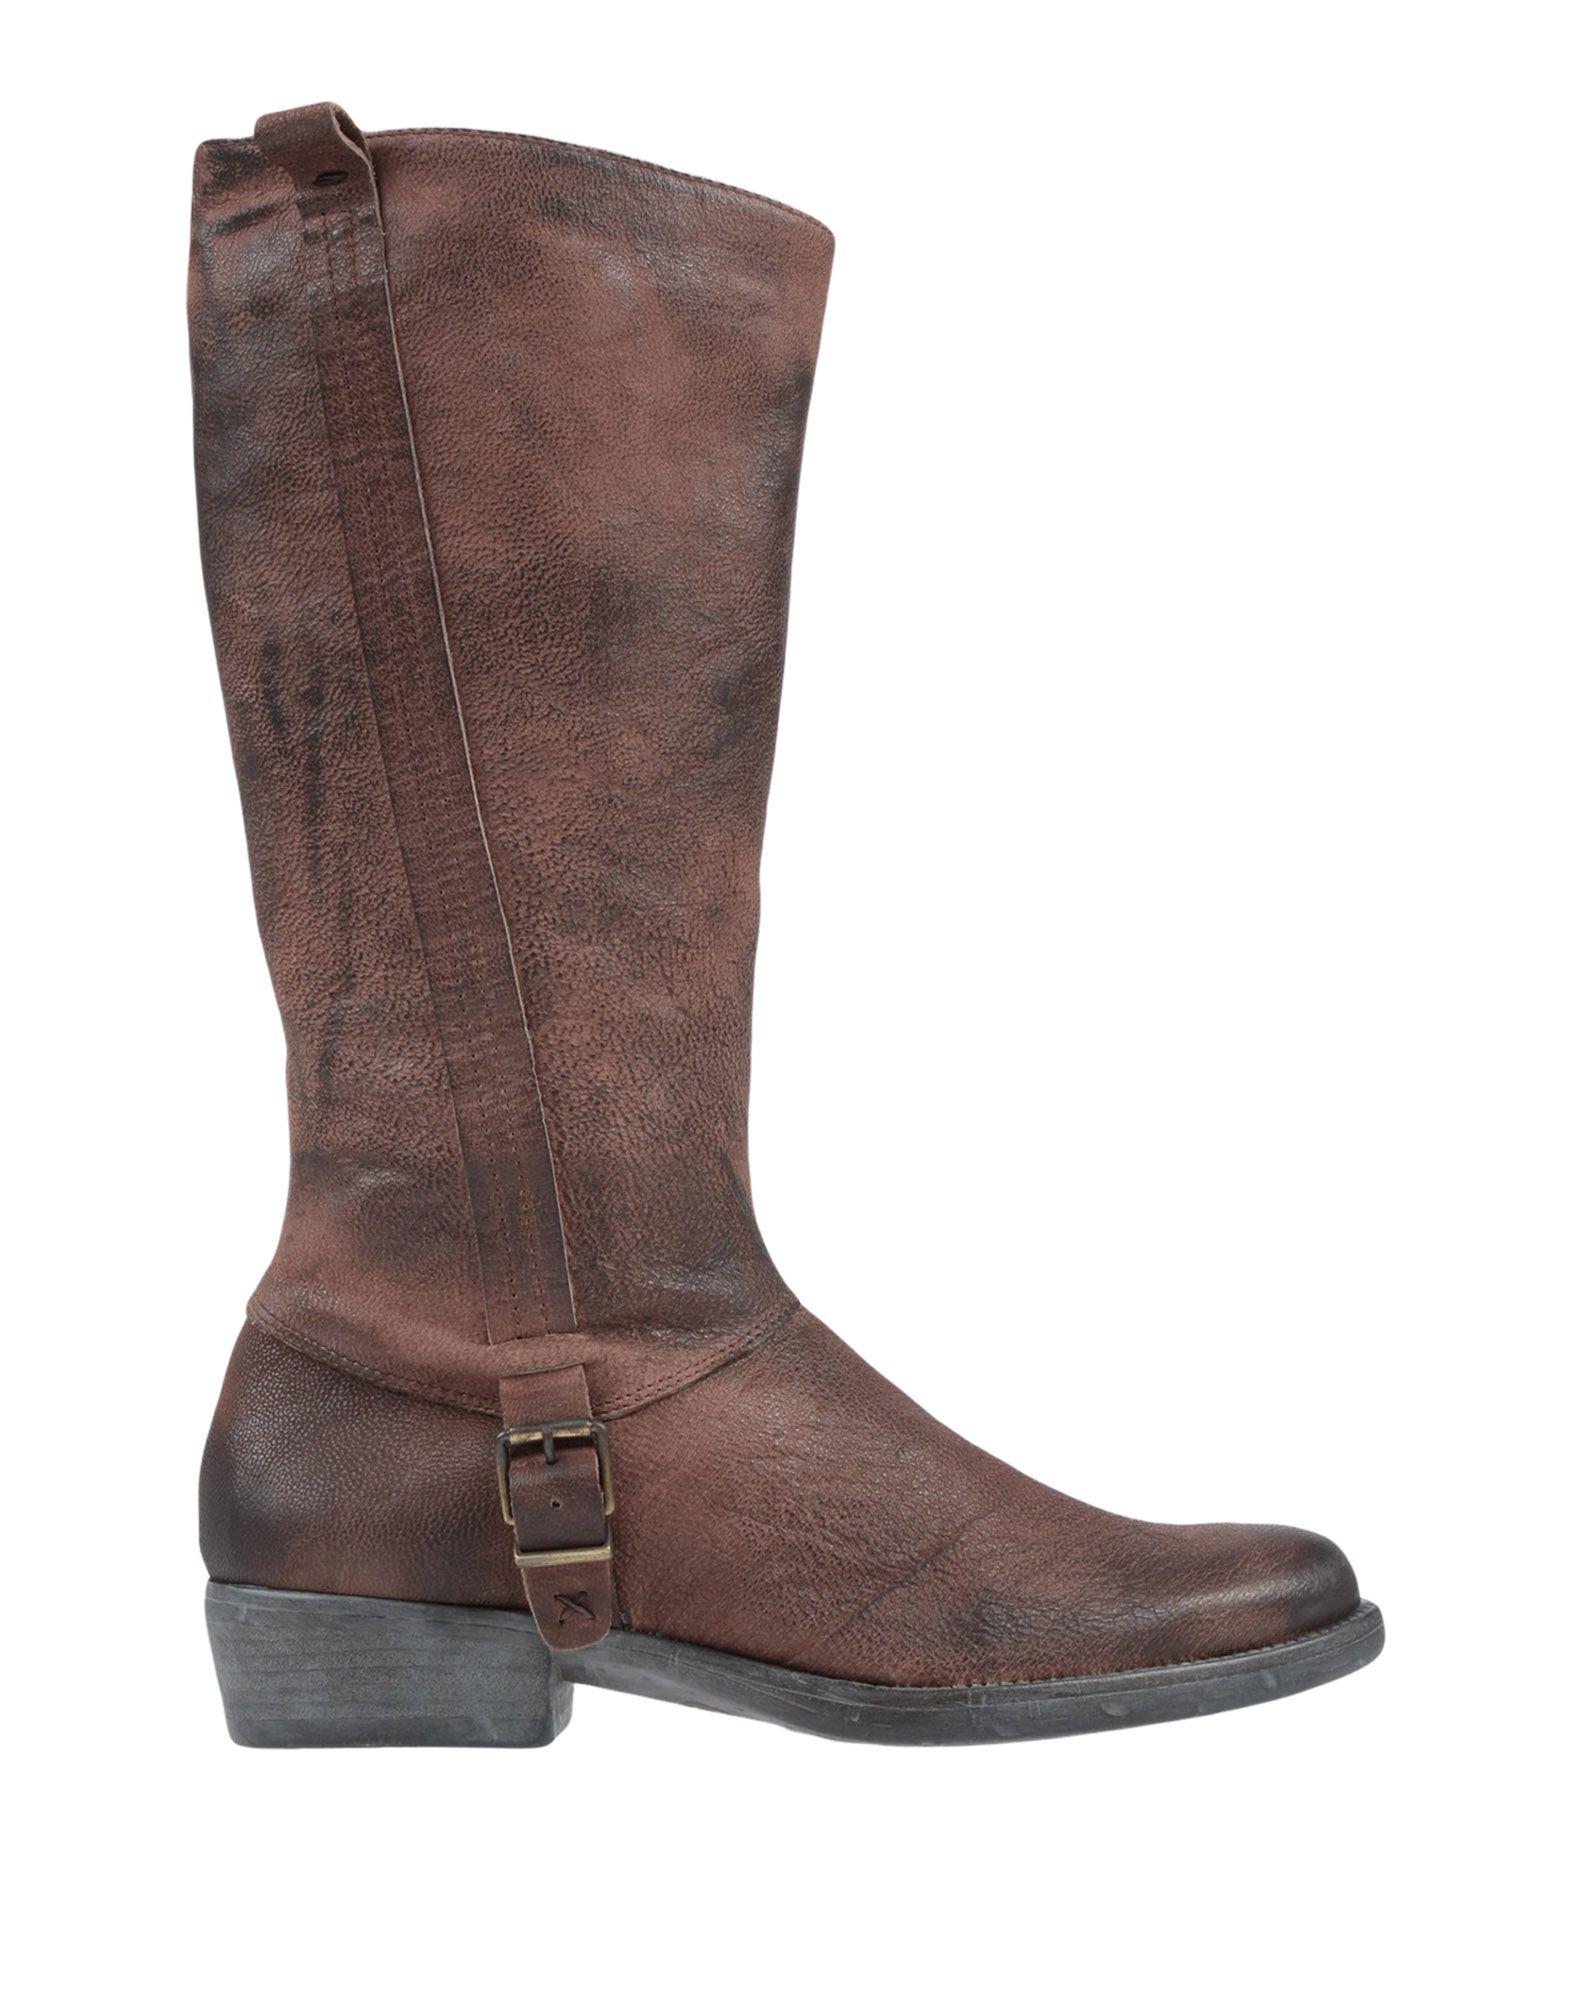 Clocharme Boots - Women Clocharme Boots online on on on  United Kingdom - 11527835JB 0366f7